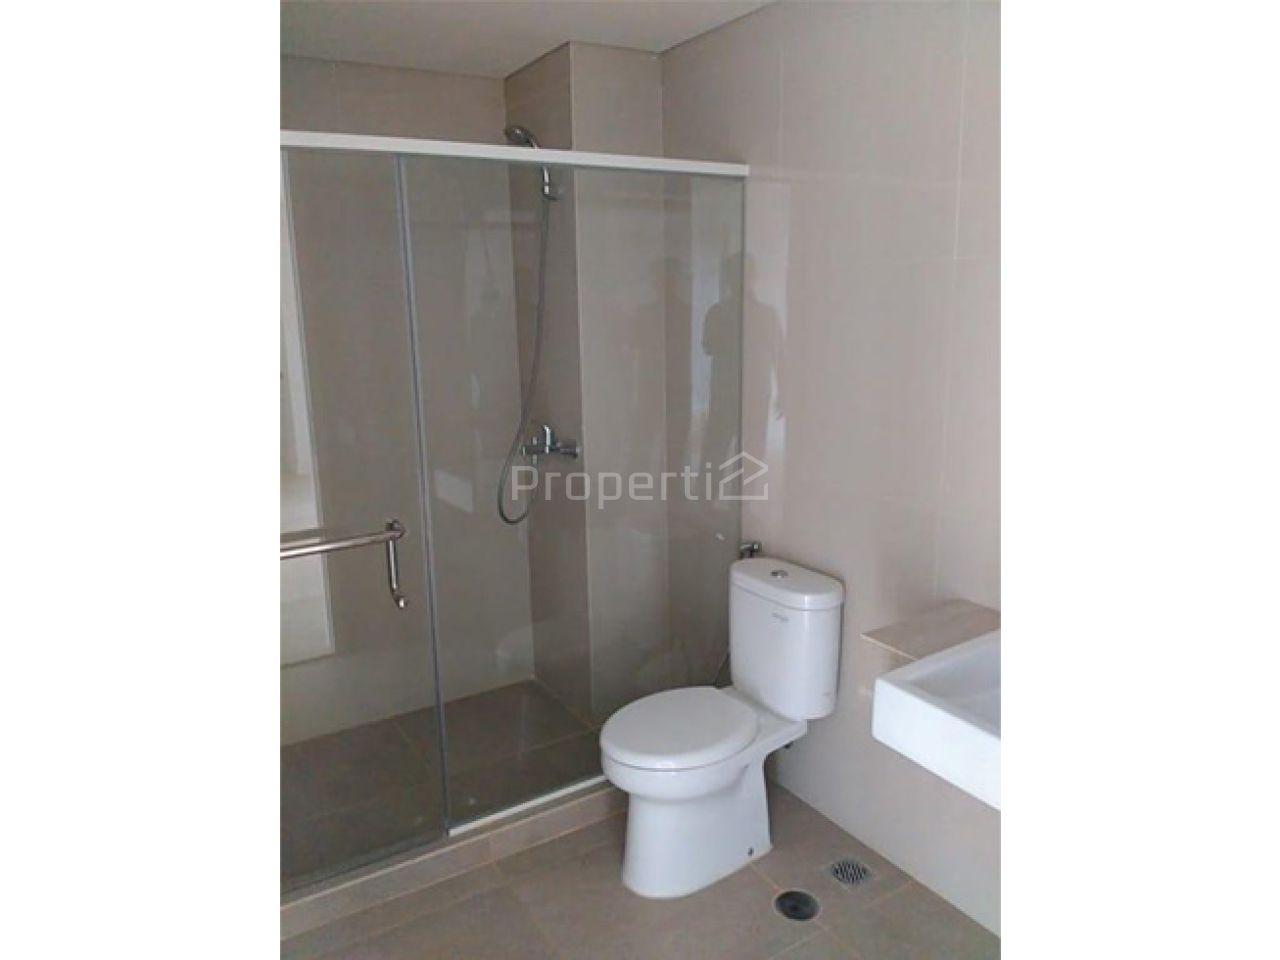 2BR Apartment Unit at Landmark Residence, 3th Floor, Kota Bandung